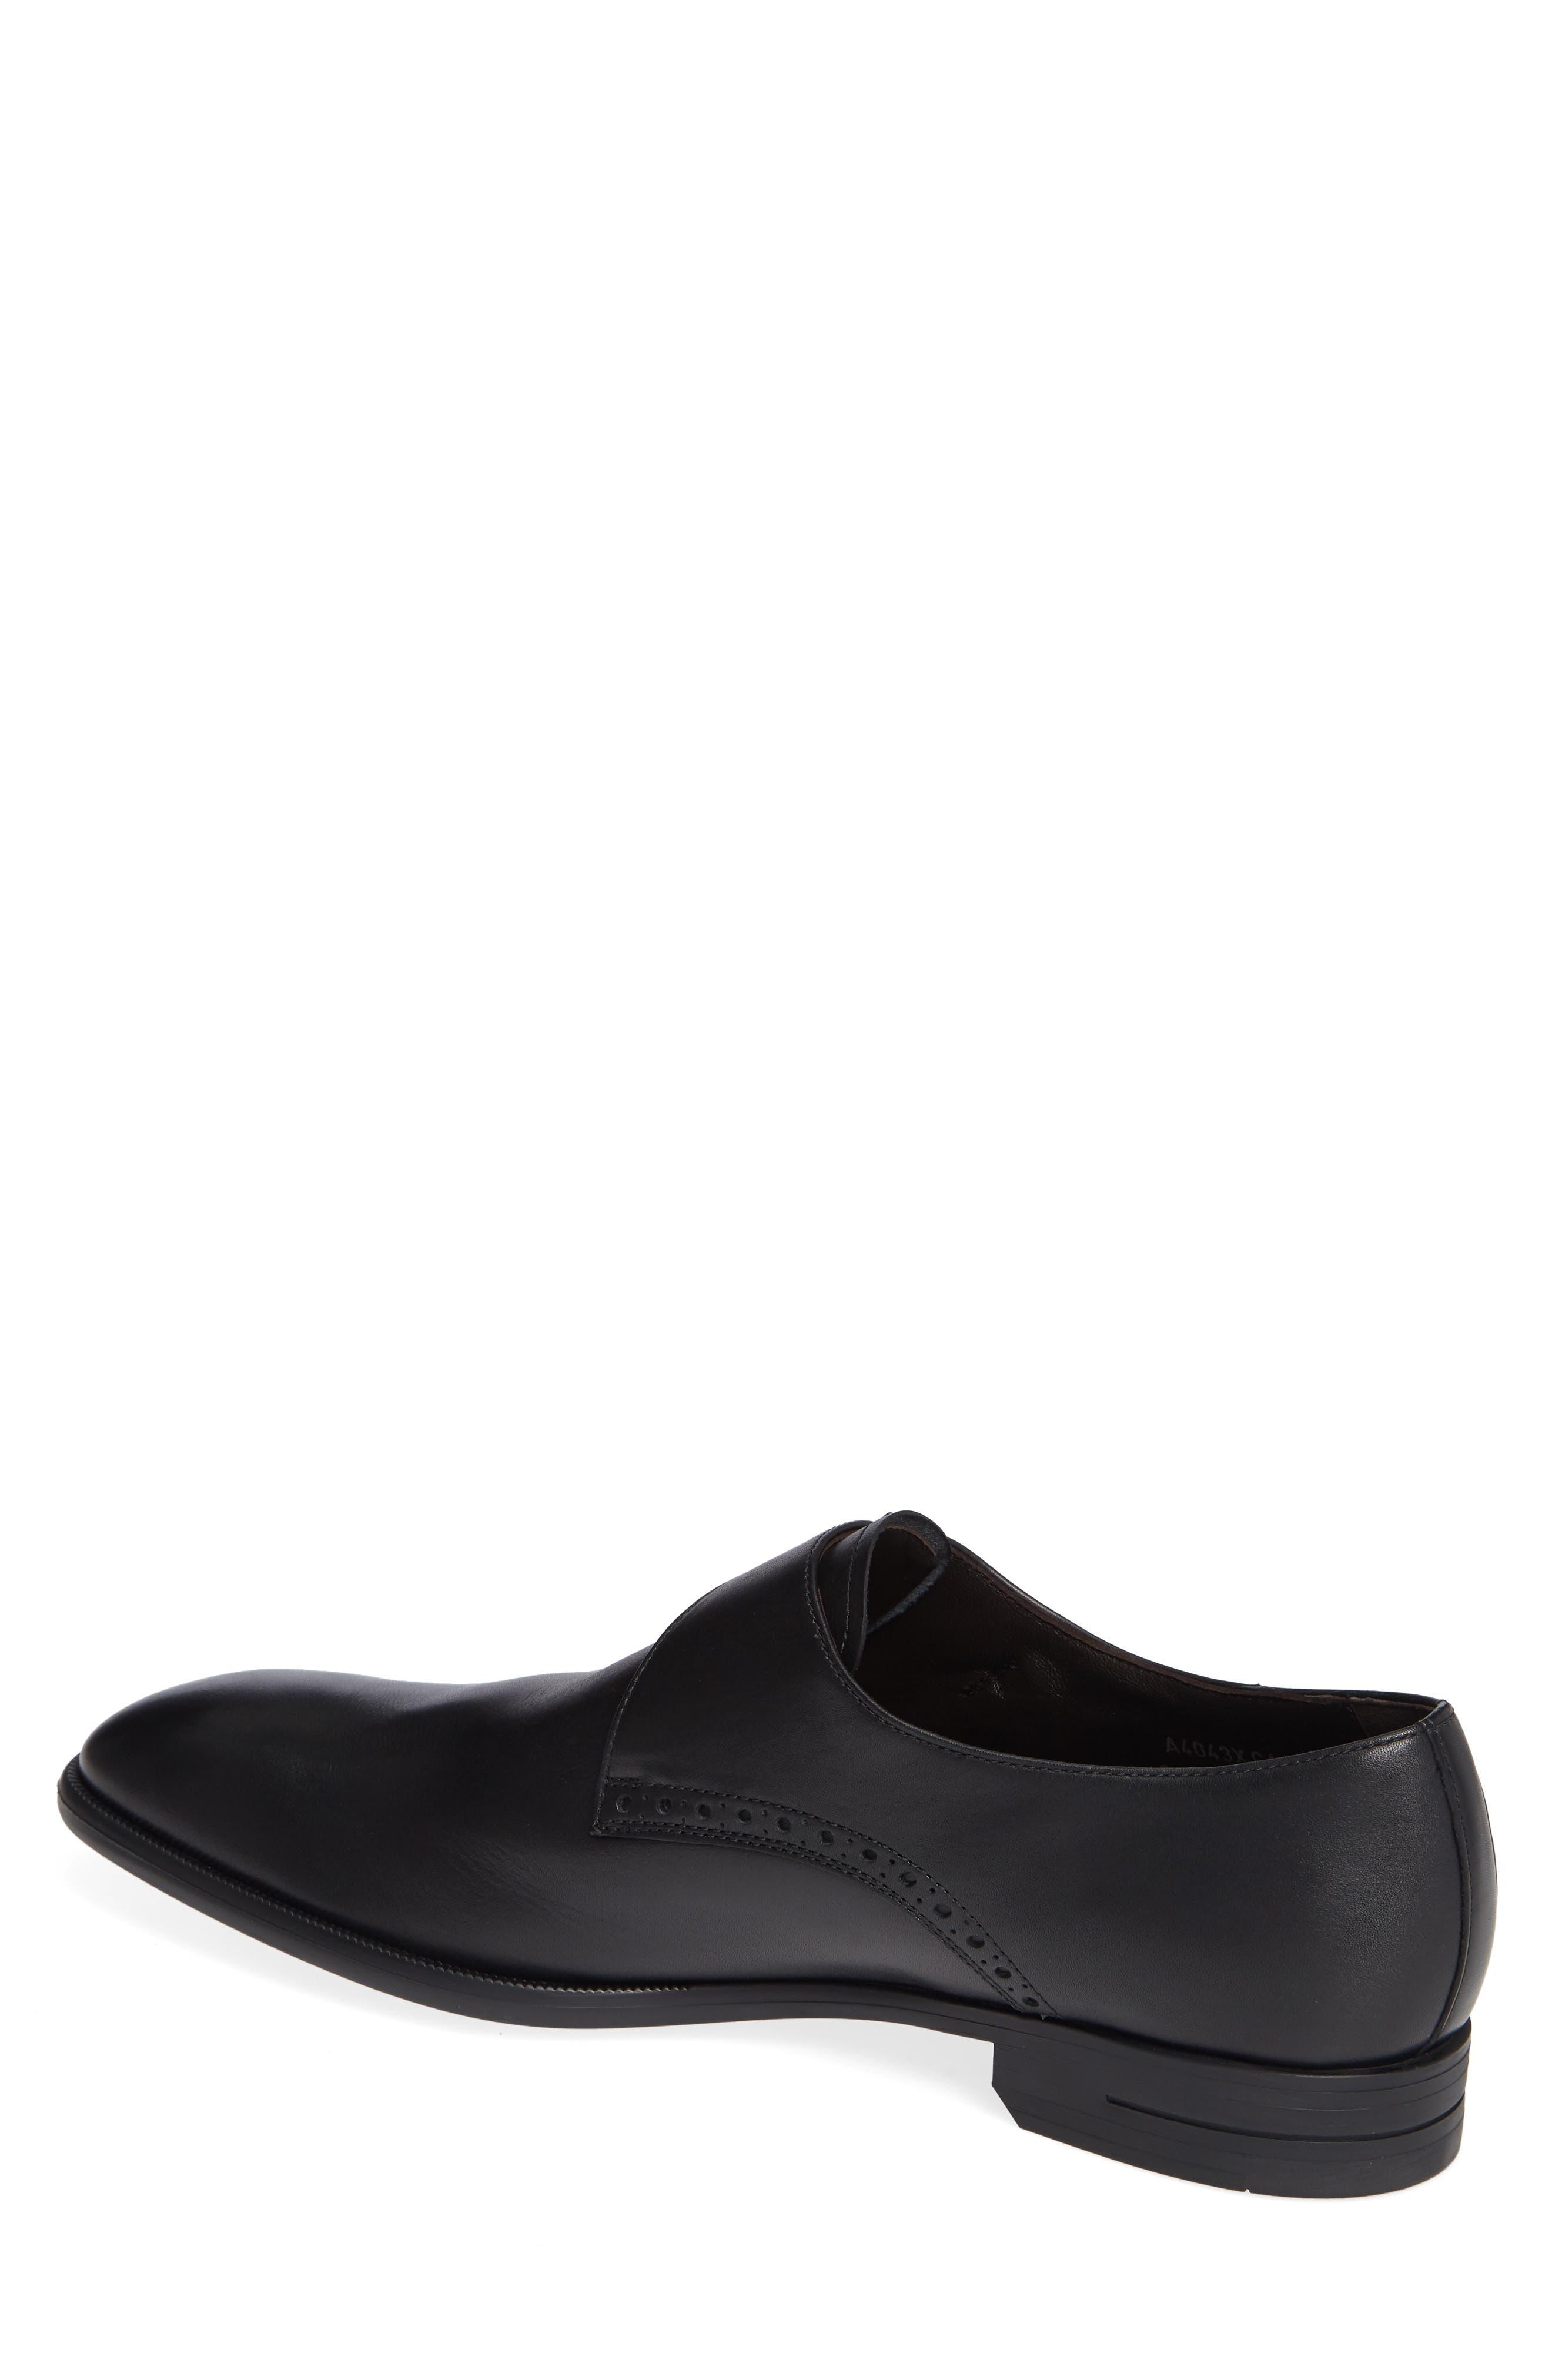 ERMENEGILDO ZEGNA, Single Strap Monk Shoe, Alternate thumbnail 2, color, BLACK